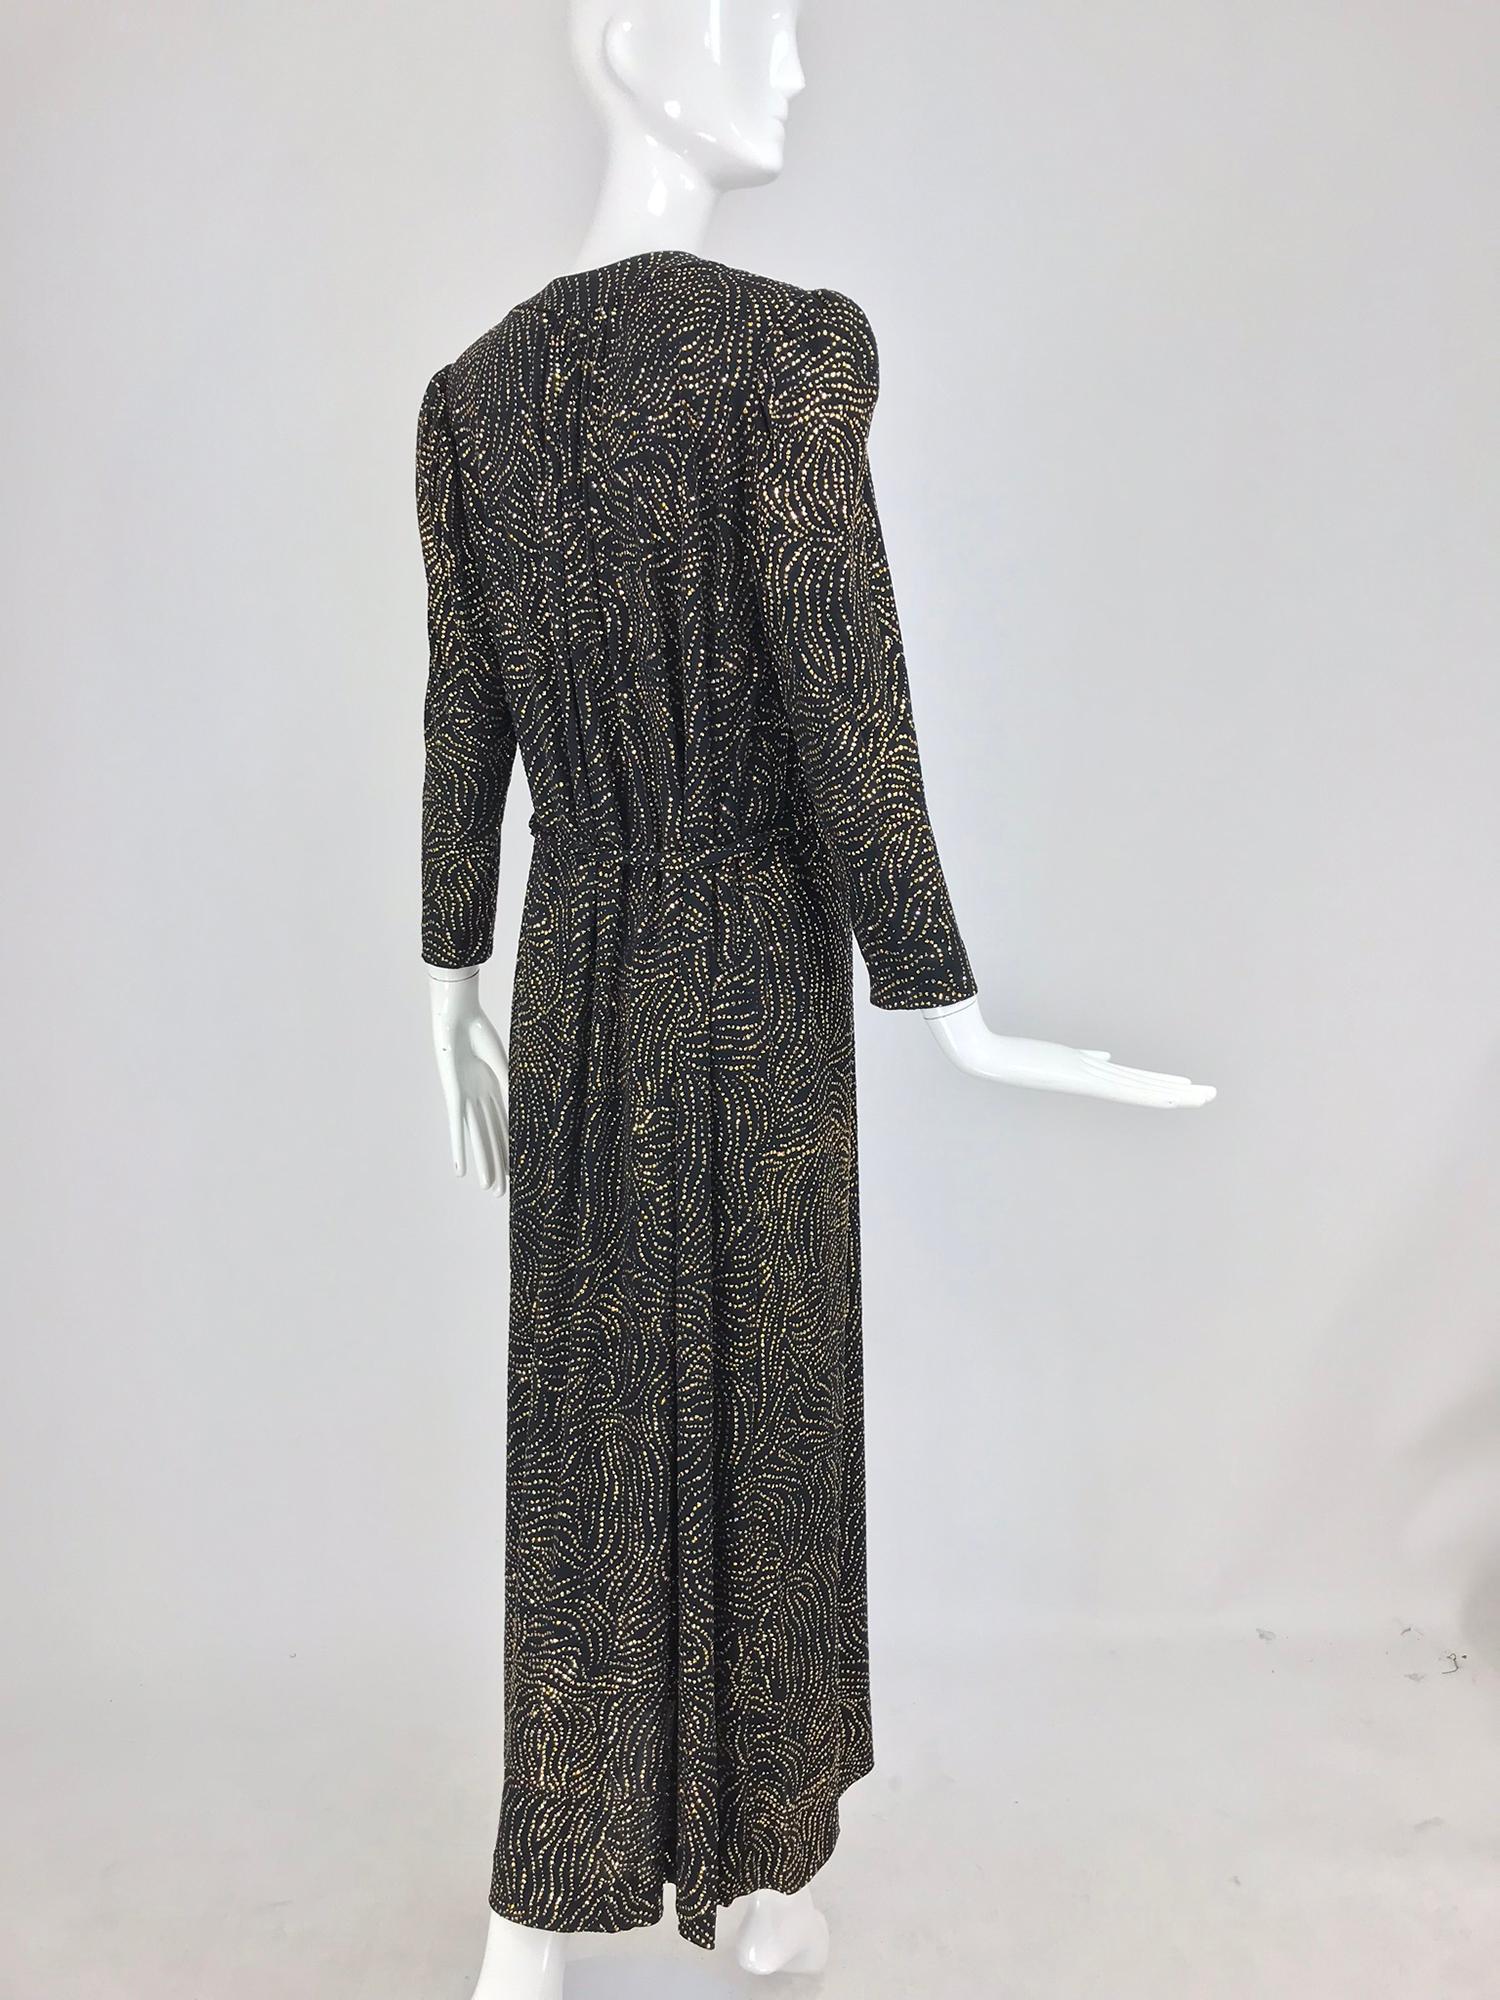 8ef76f9058c Racine Paris black and gold glitter Maxi dress with Tassel belt 1970s For  Sale at 1stdibs